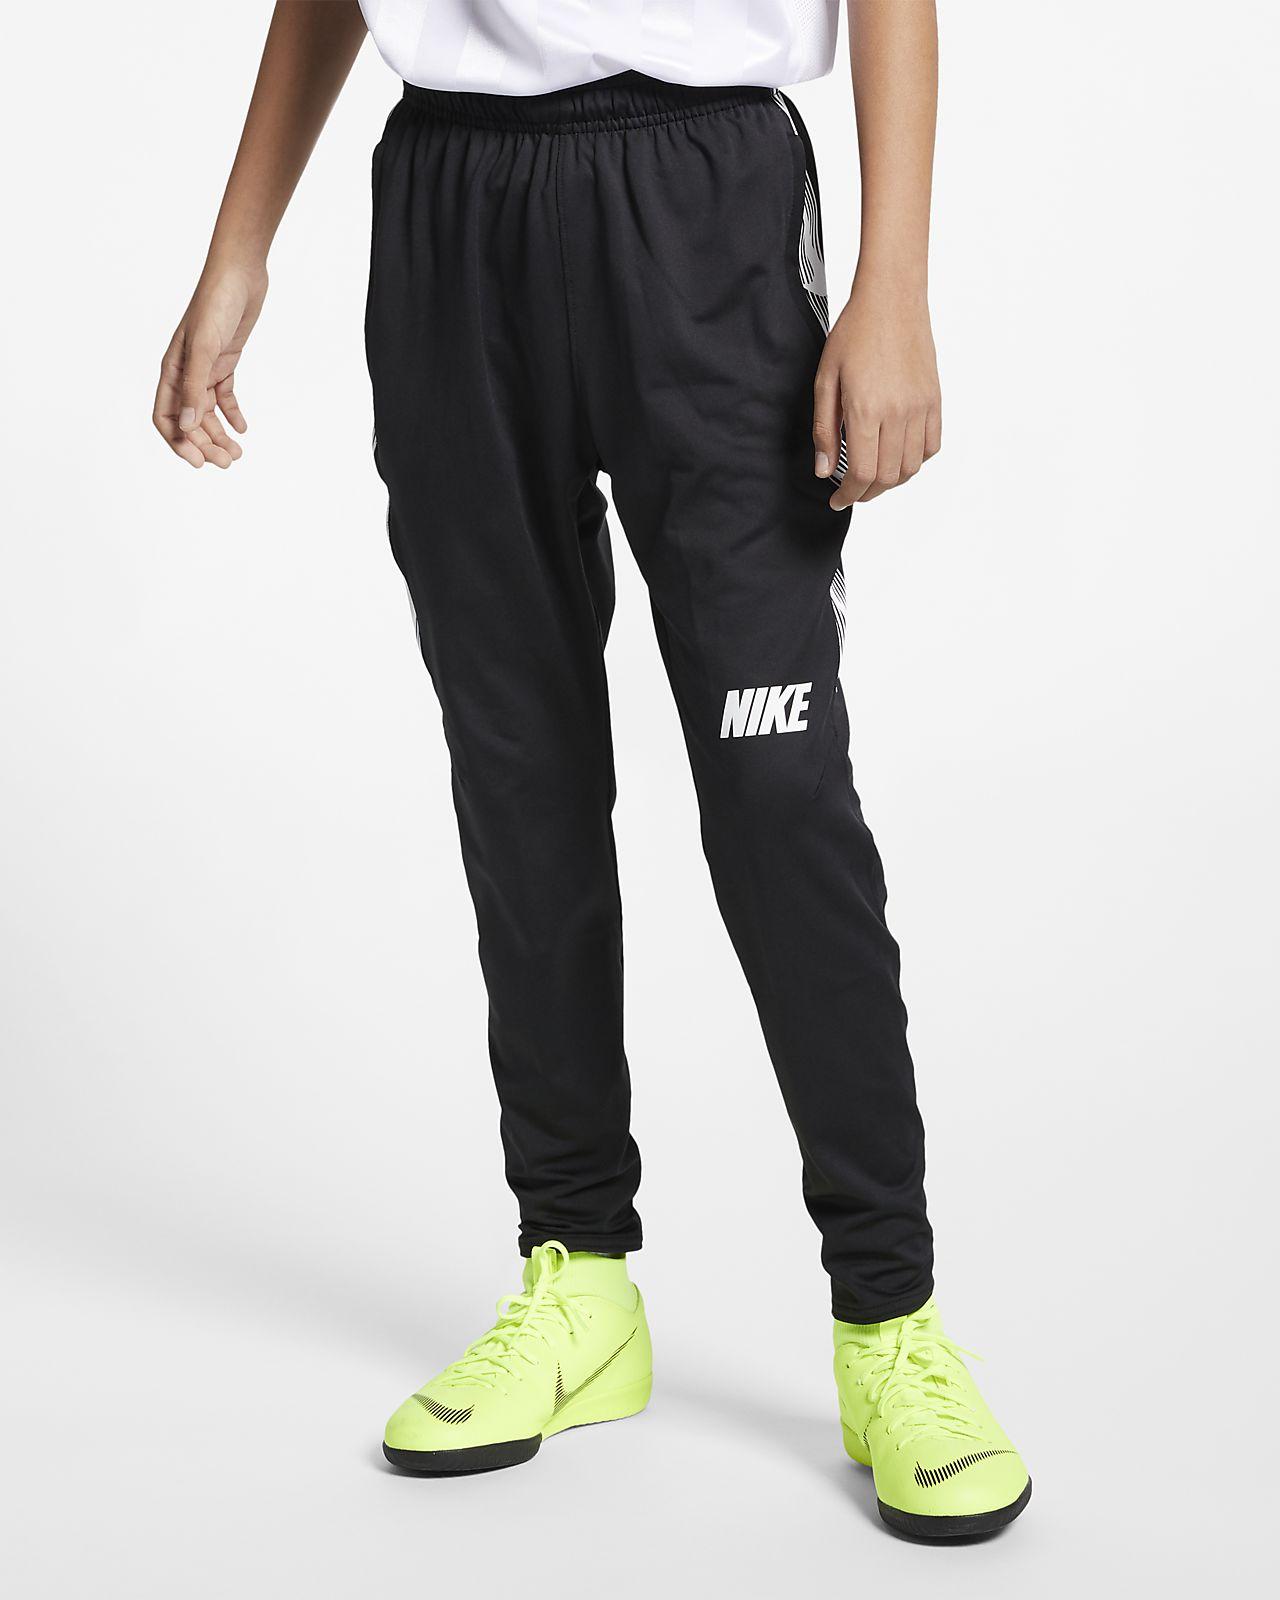 Nike Dri-FIT Squad Pantalón de fútbol - Niño/a